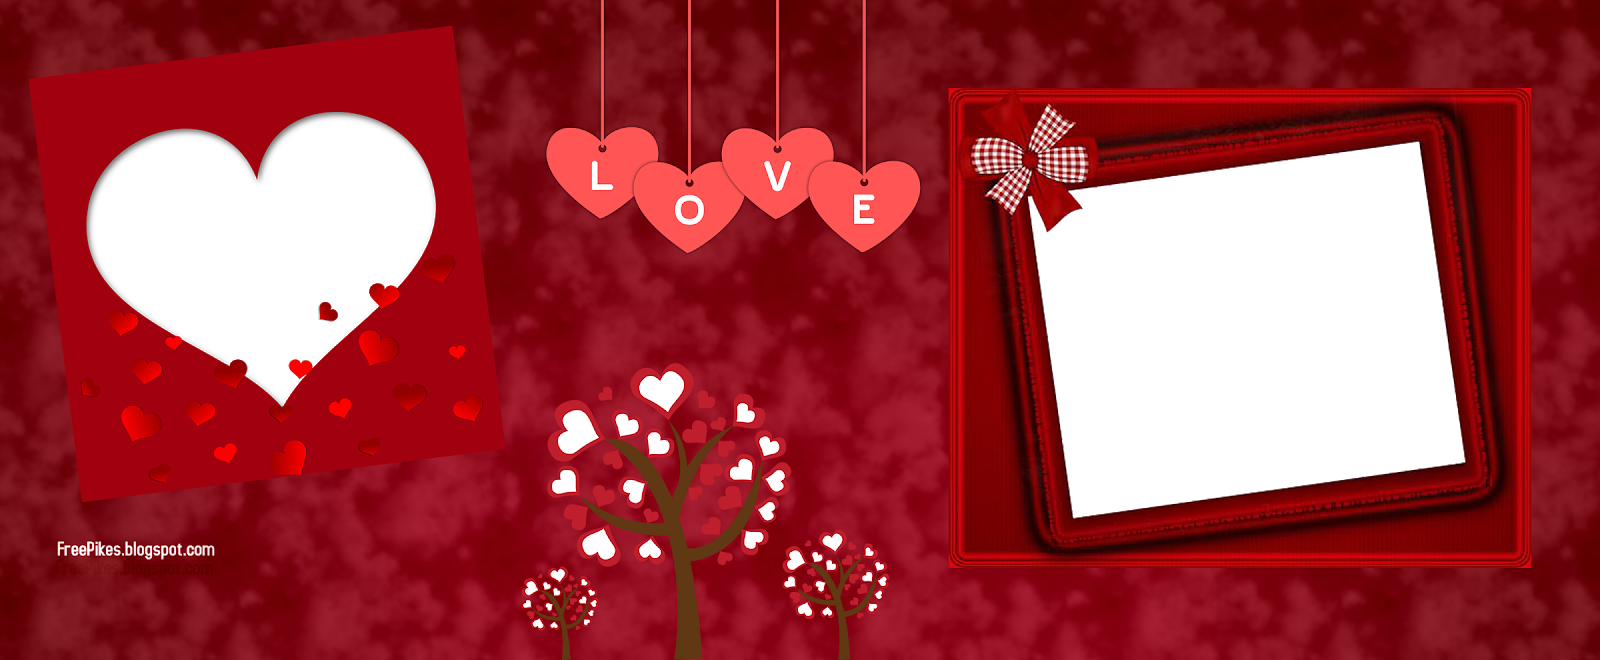 i love you png download free i love u png mug design template heart 4275123 vippng love u png mug design template heart